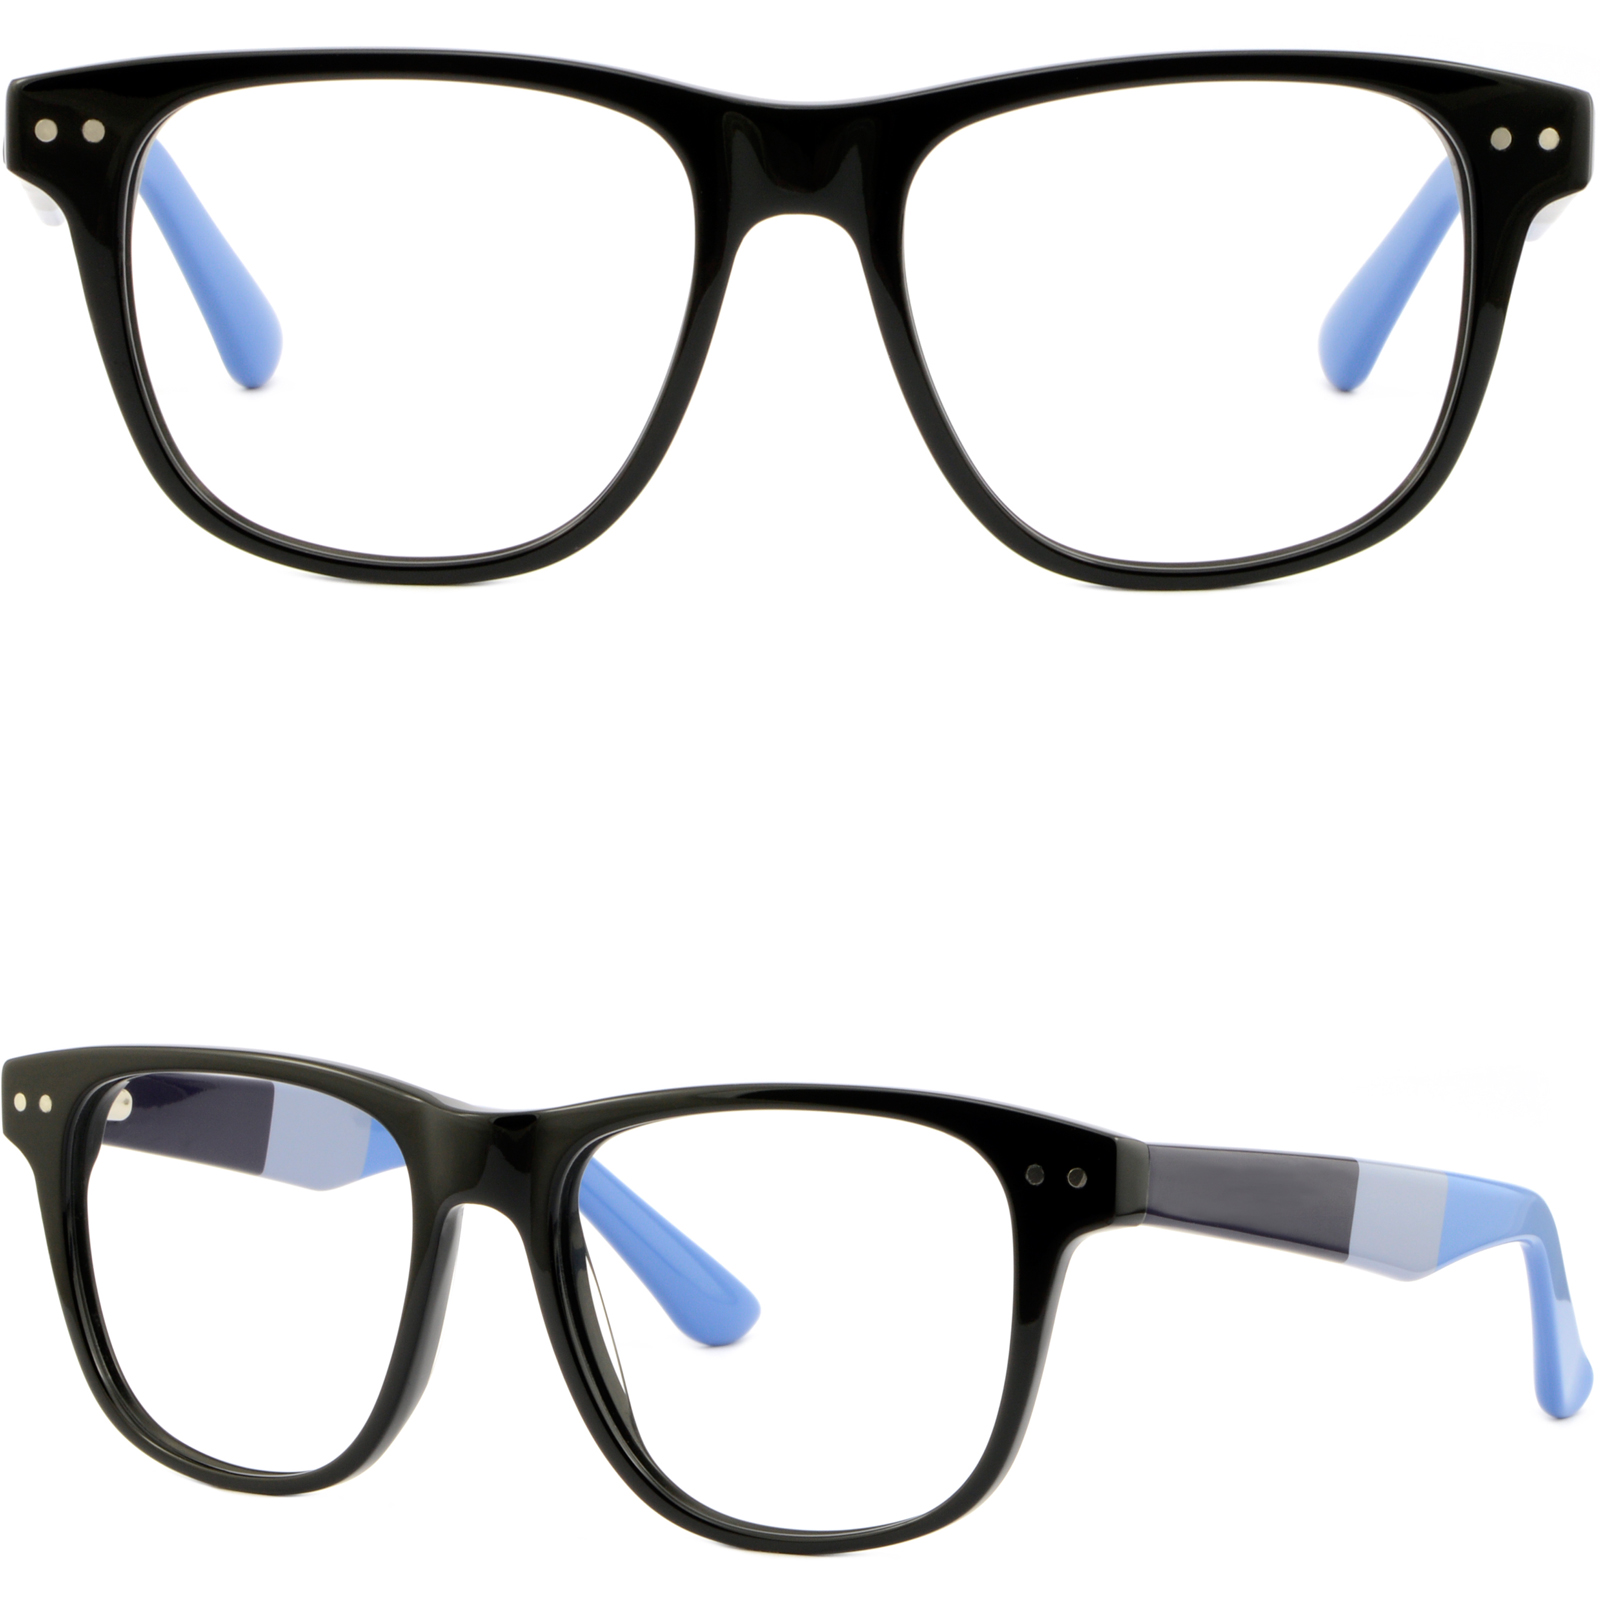 Oversized Black Square Mens Plastic Frame Wide Glasses Silver Dots Spring Hinges